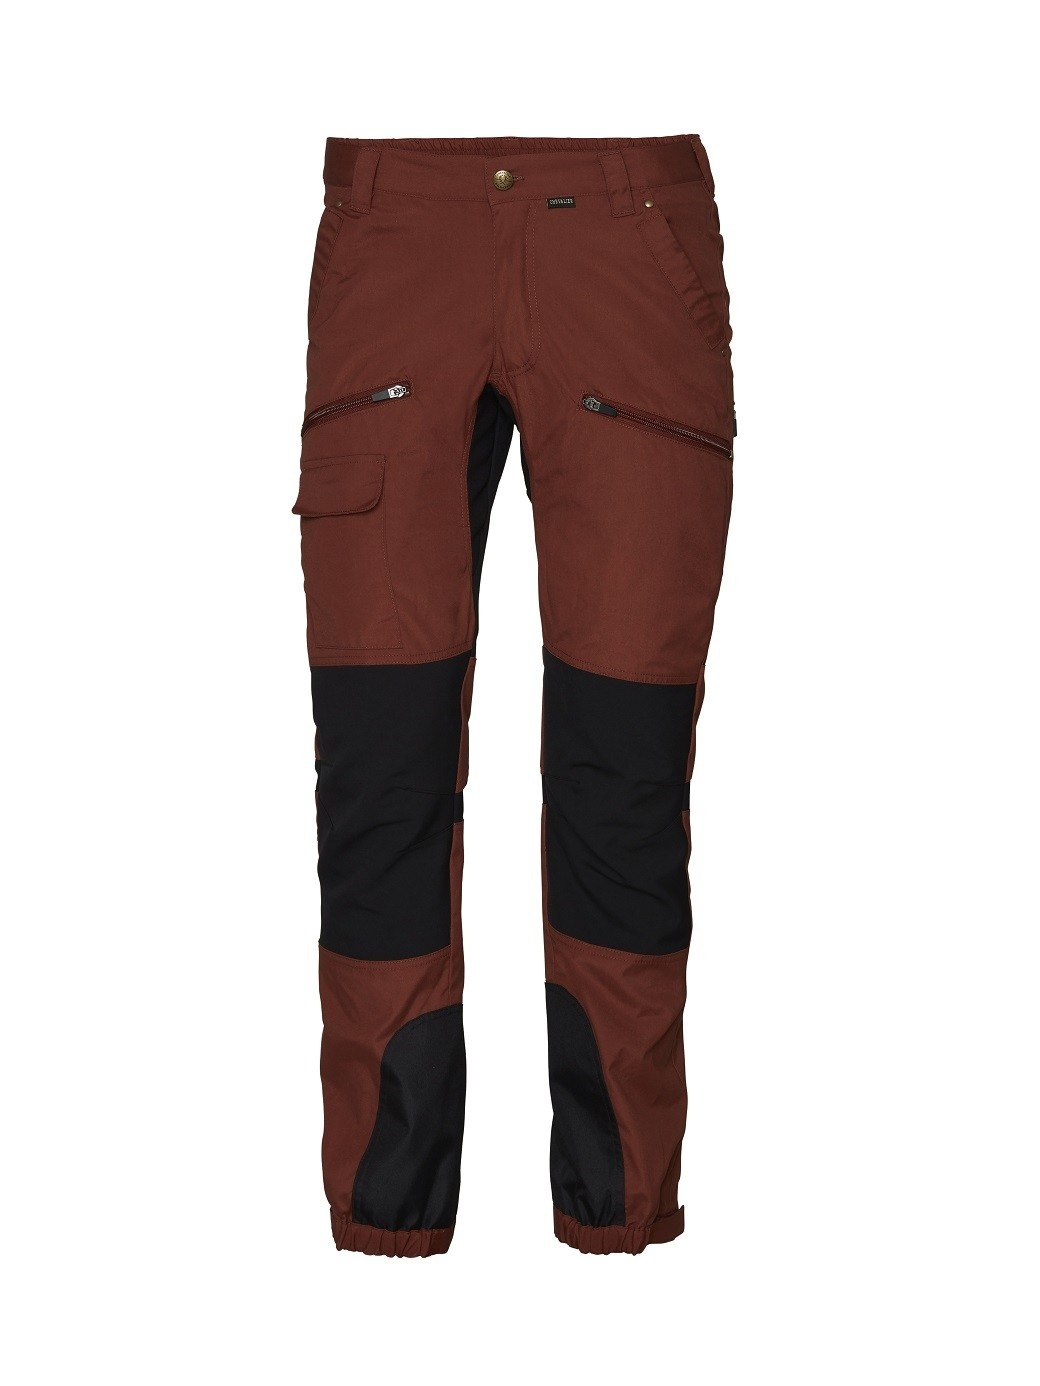 Chevalier Alabama Vent Pro Pant Orange Black-1